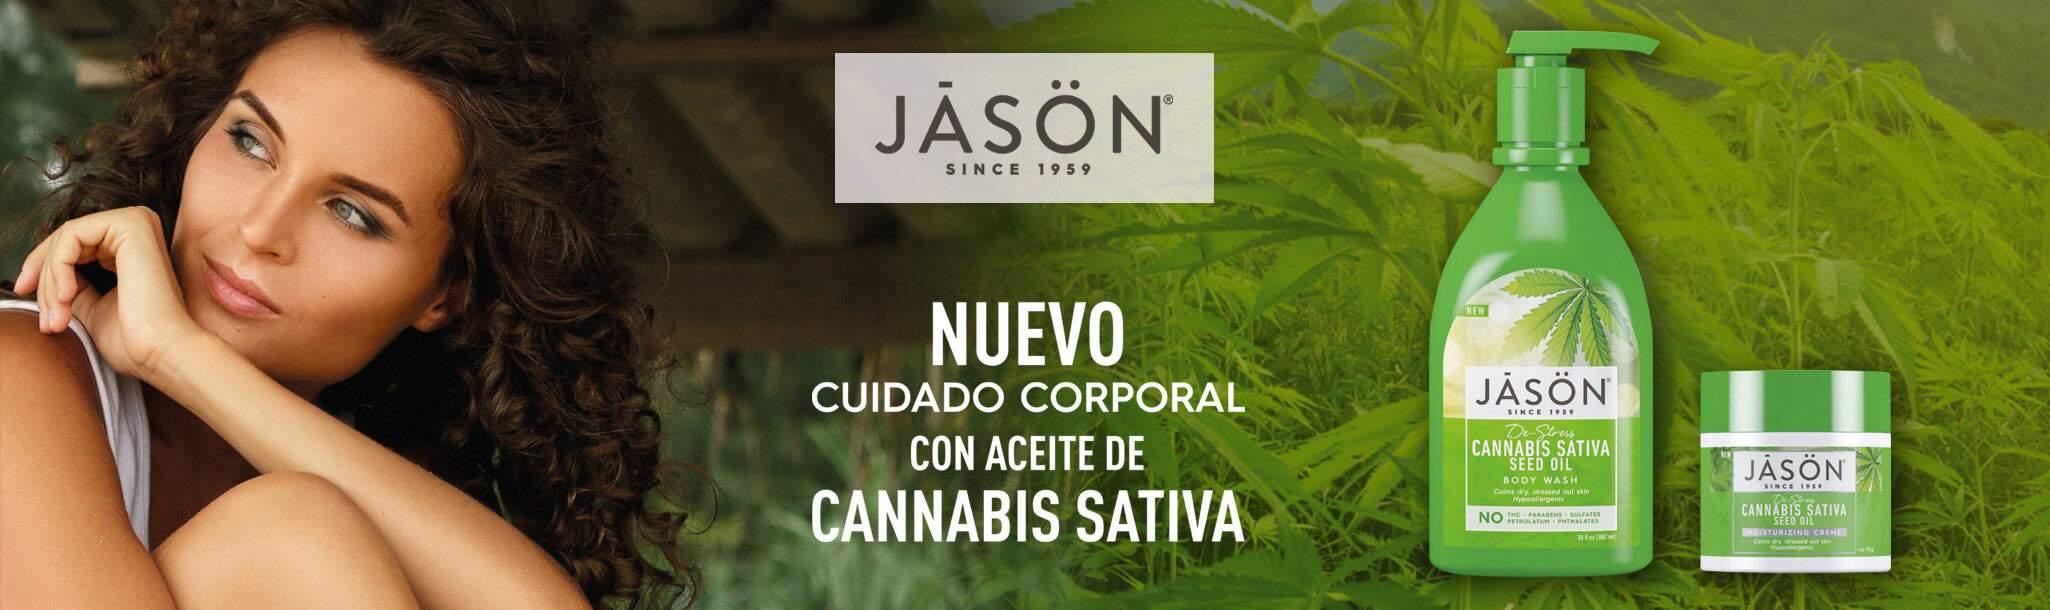 Aceite de cannabis sativa